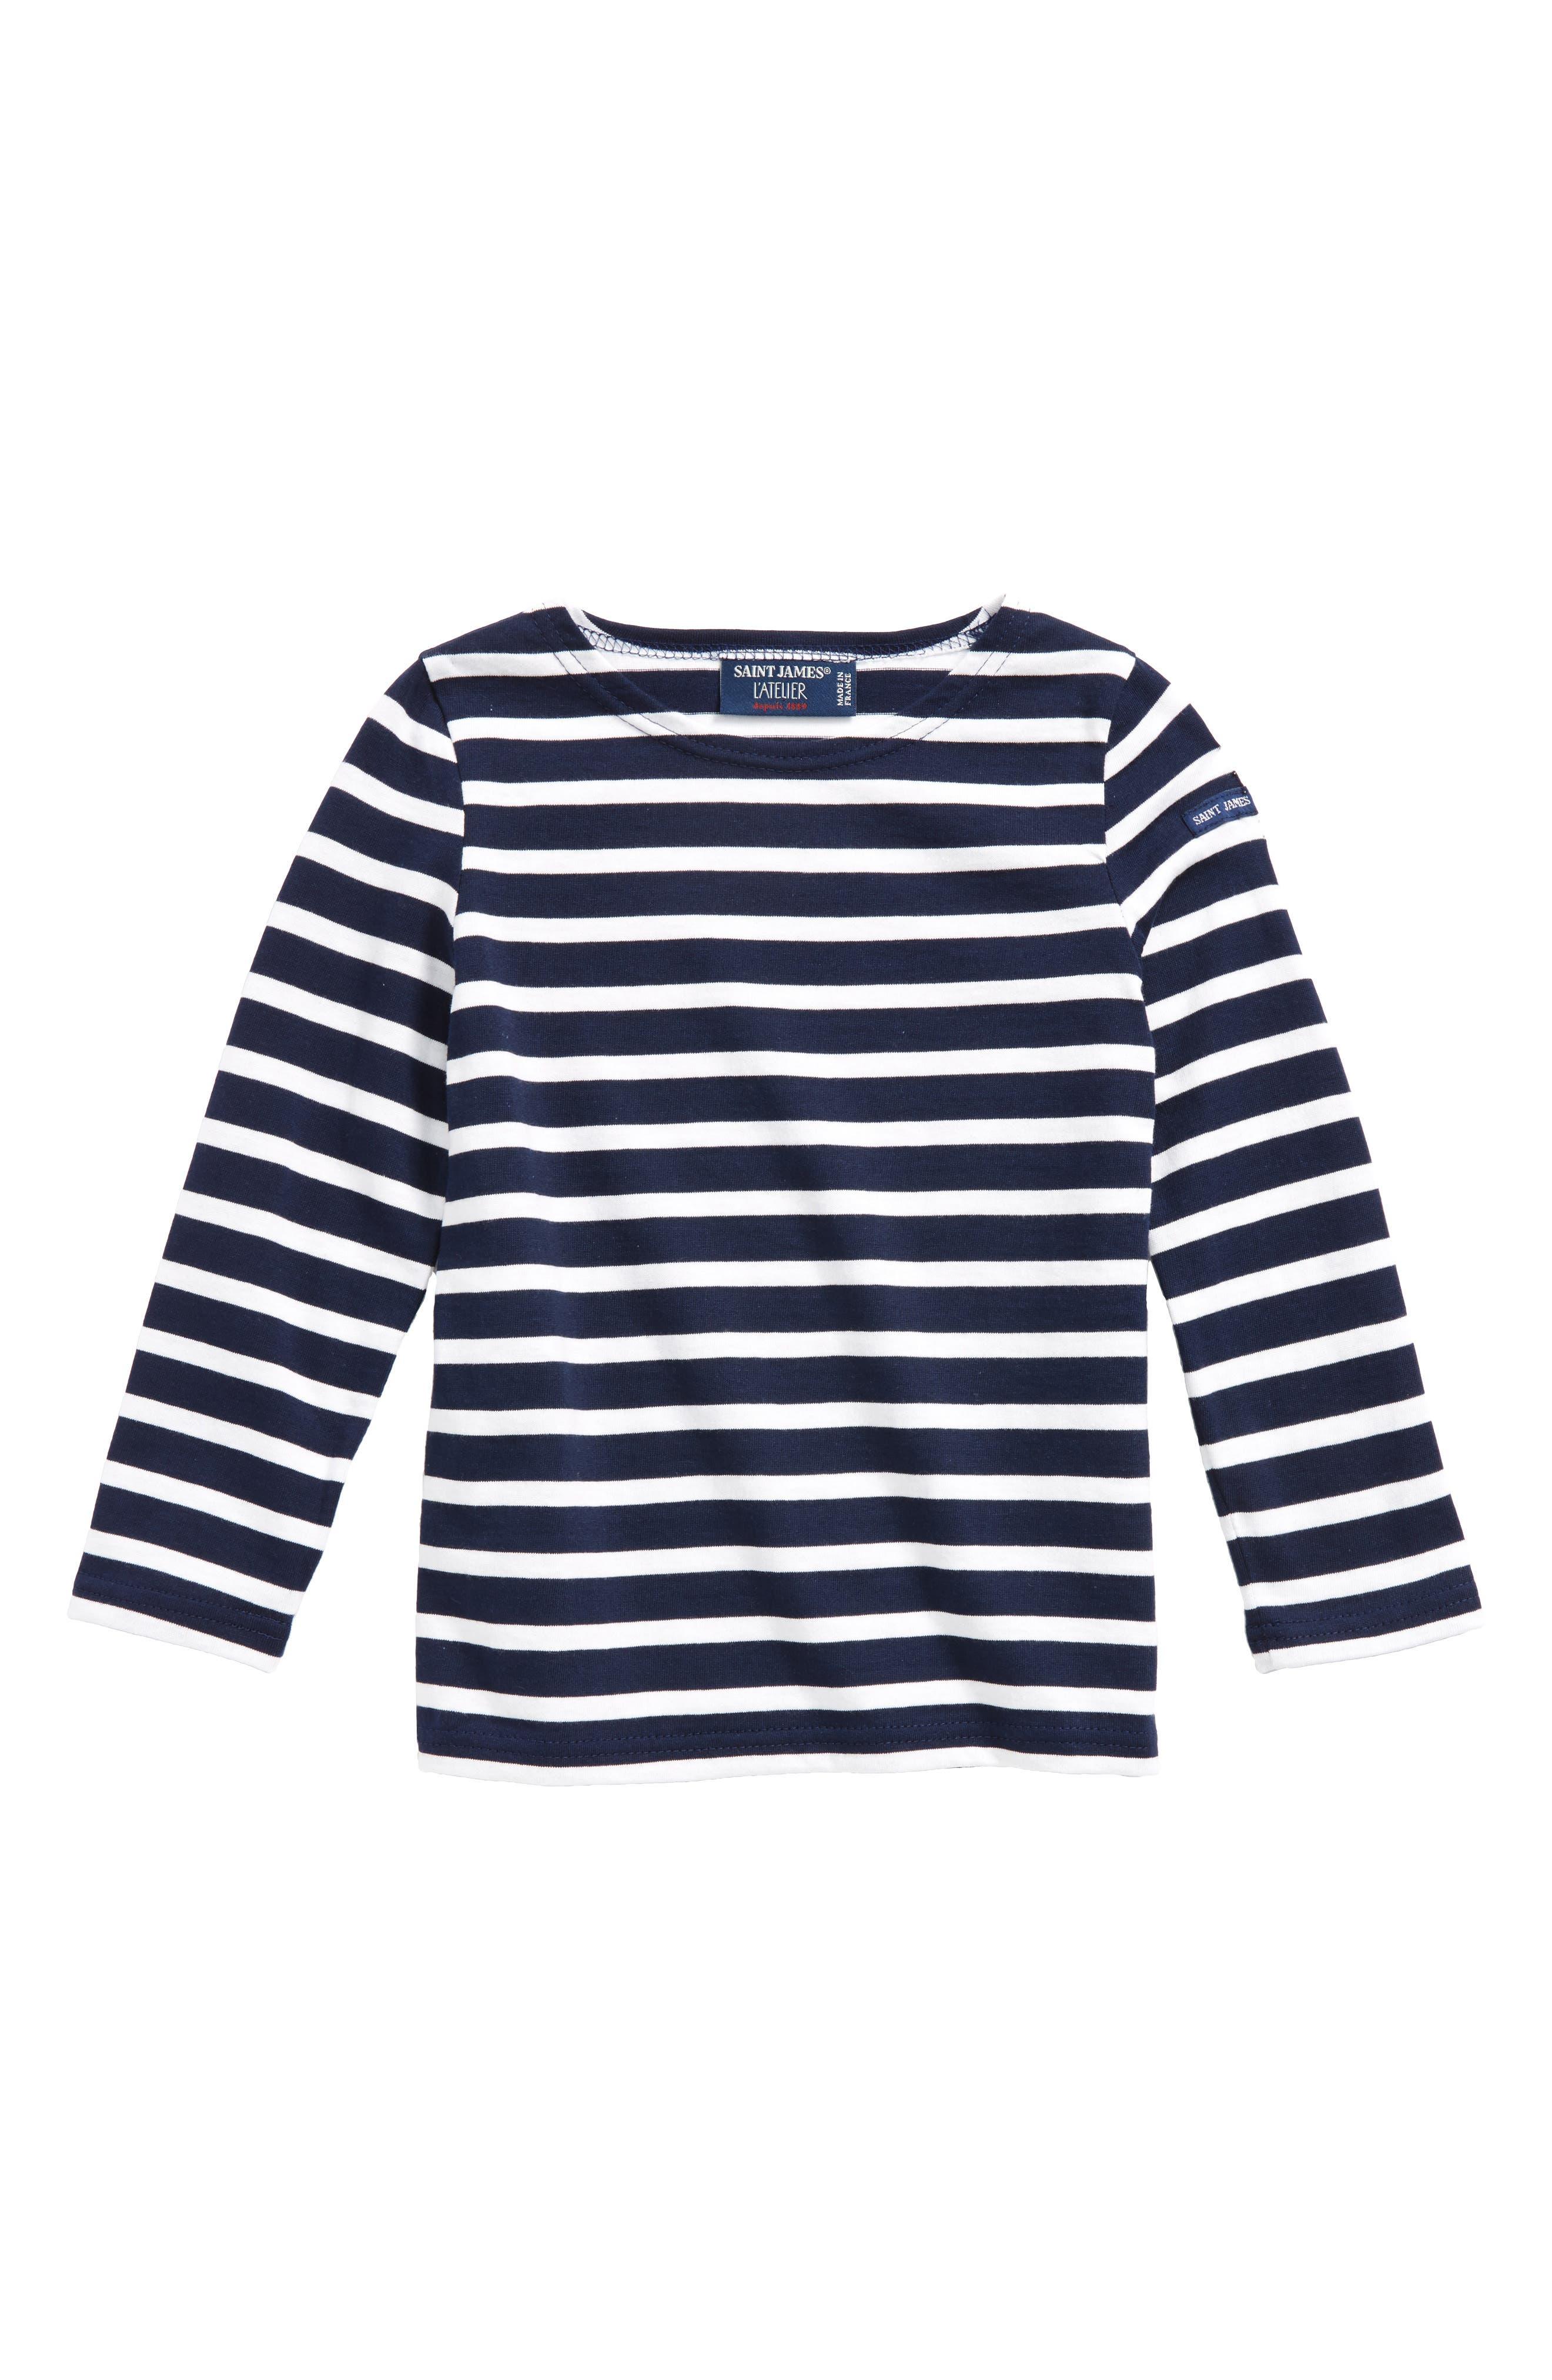 Minquiers Striped Sailor Shirt,                         Main,                         color, 400